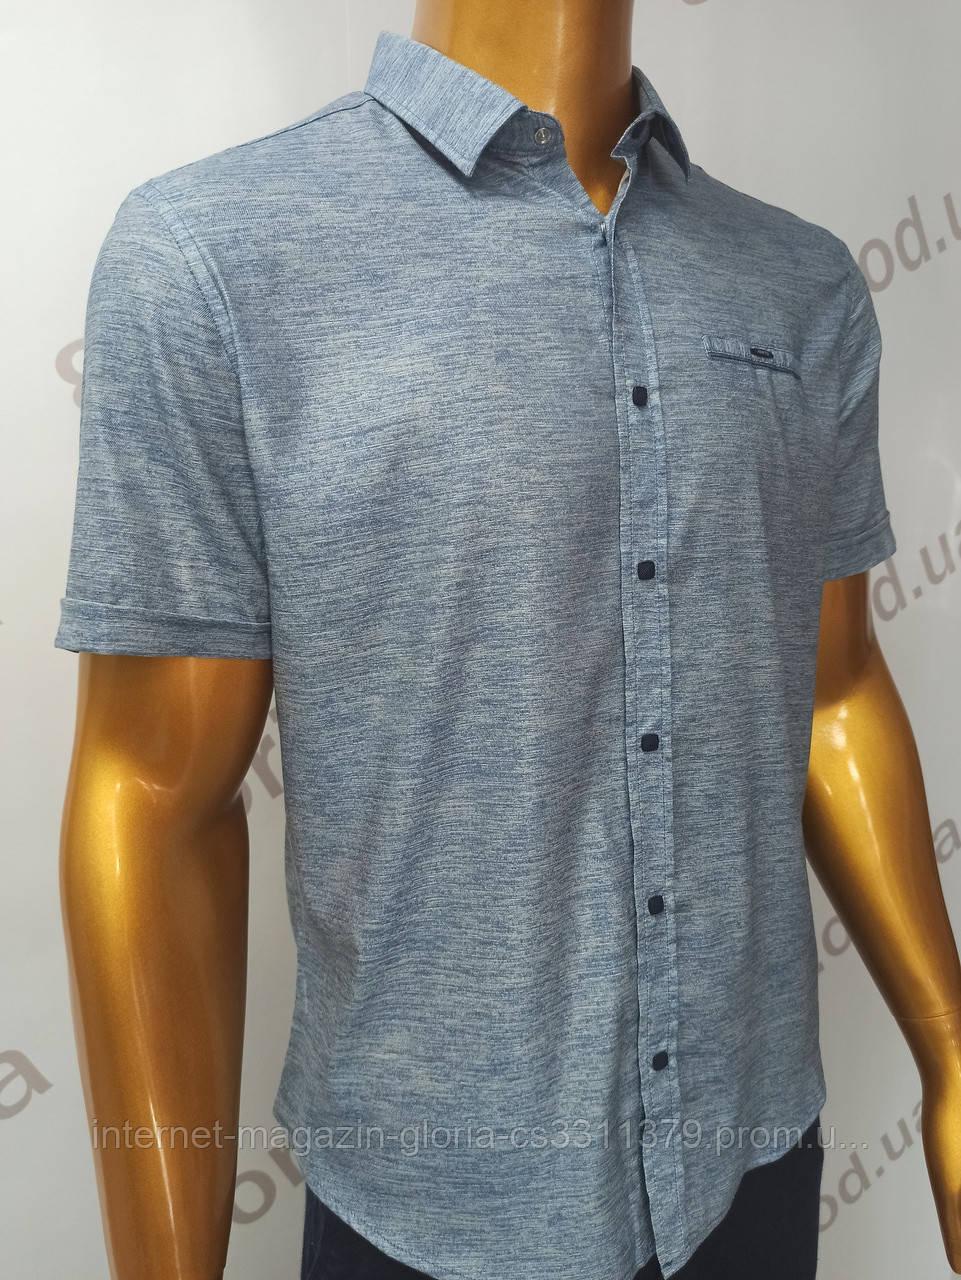 Мужская рубашка Amato. AG.19638-2(s). Размеры:M,L,XL(2), 2XL.